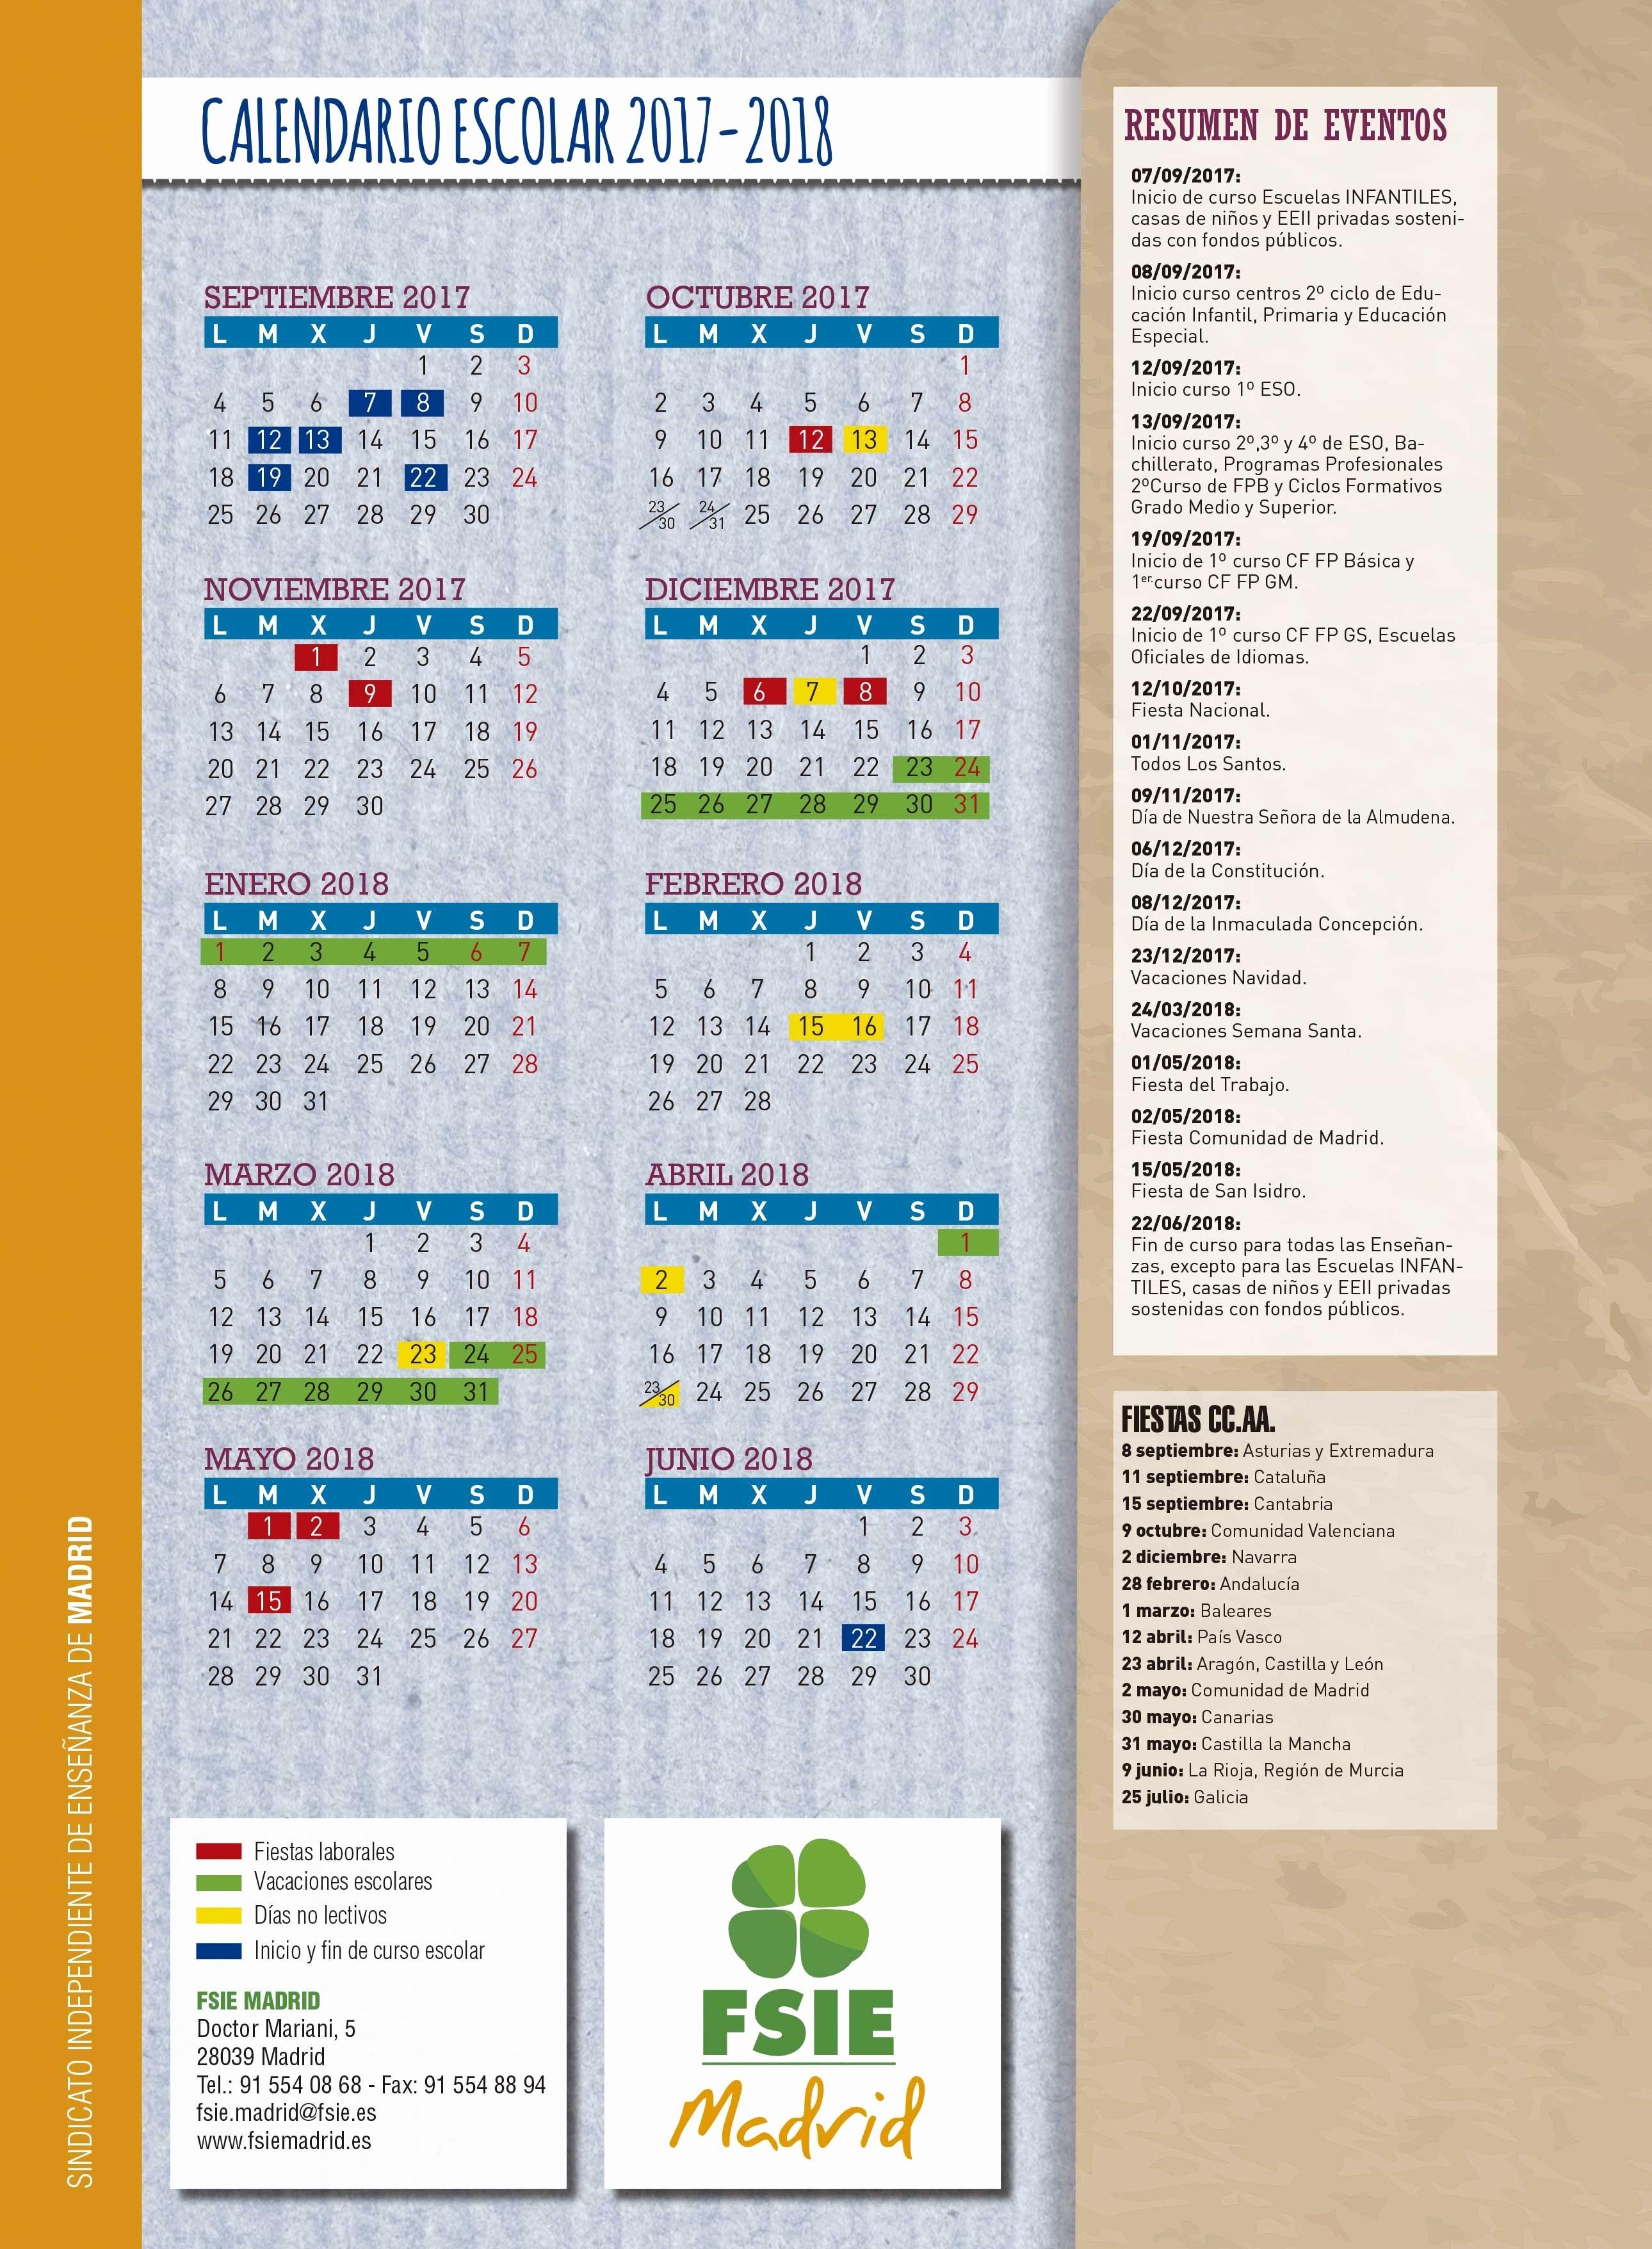 calendario 2019 con festivos usa mas caliente elegante 31 ilustracic2b3n calendario bundesliga 15 16 2019 of calendario 2019 con festivos usa